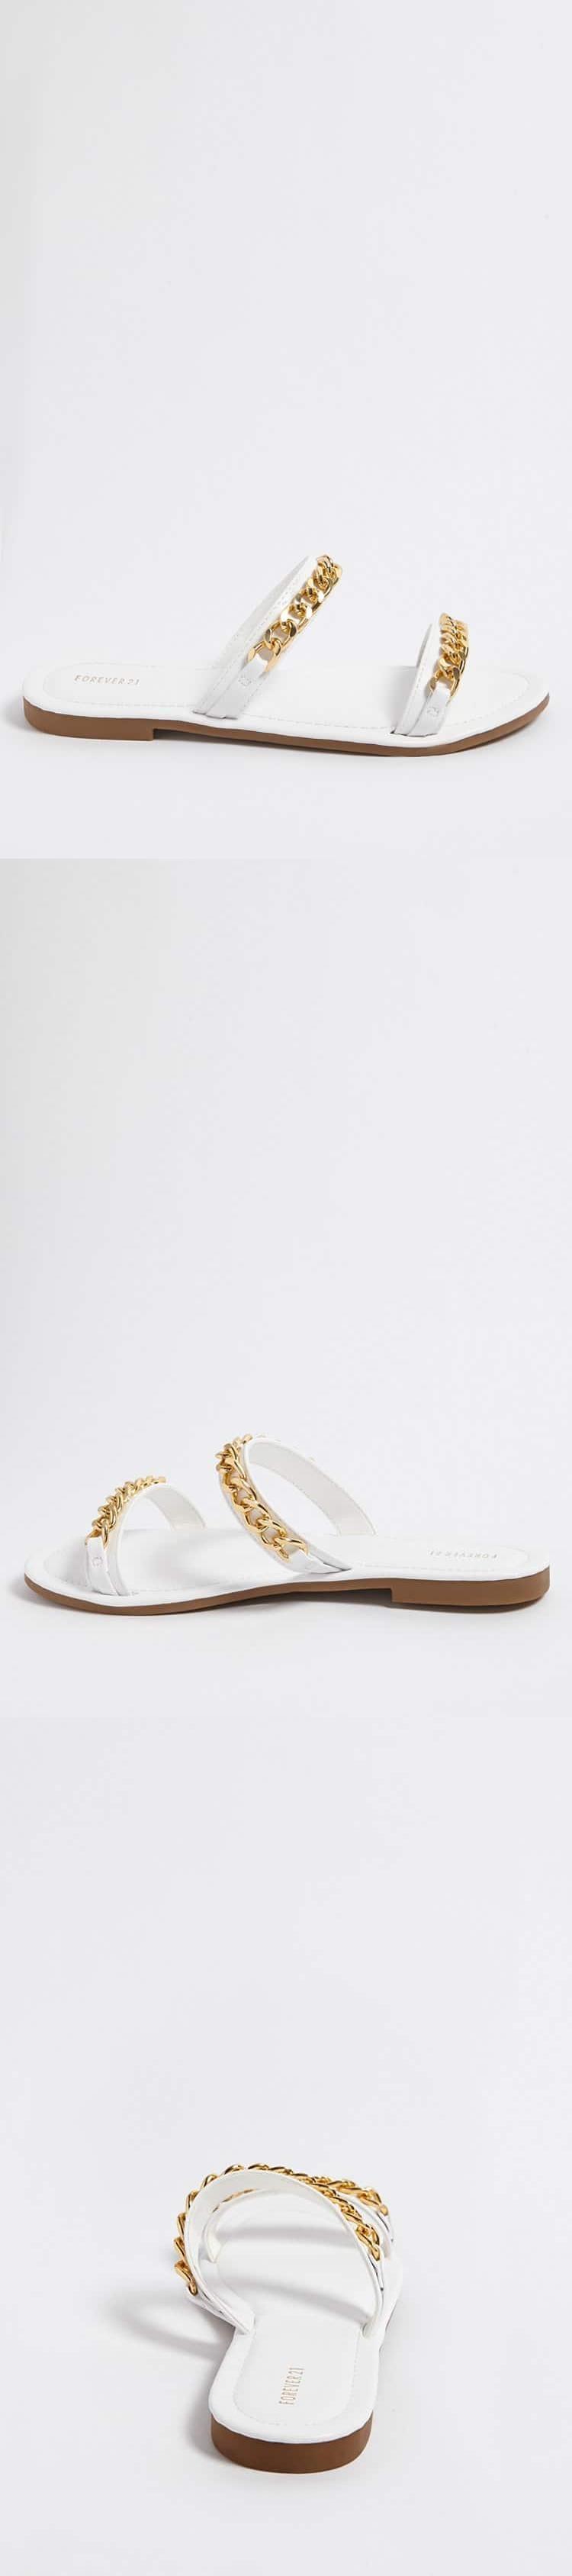 57ecba9955ab56 Curb Chain Sandals    17.90 USD    Forever 21